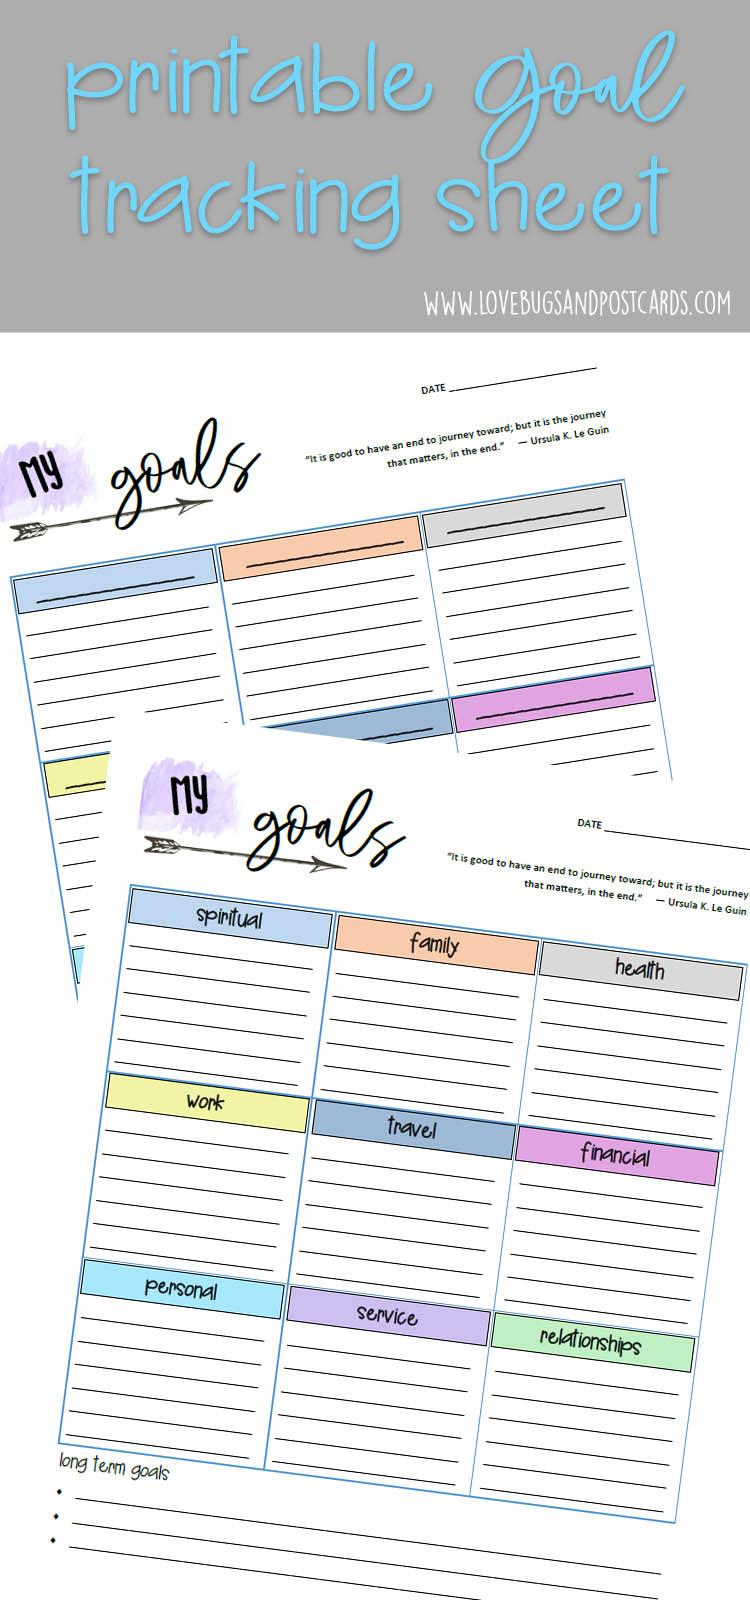 Printable Goal Tracking Sheet